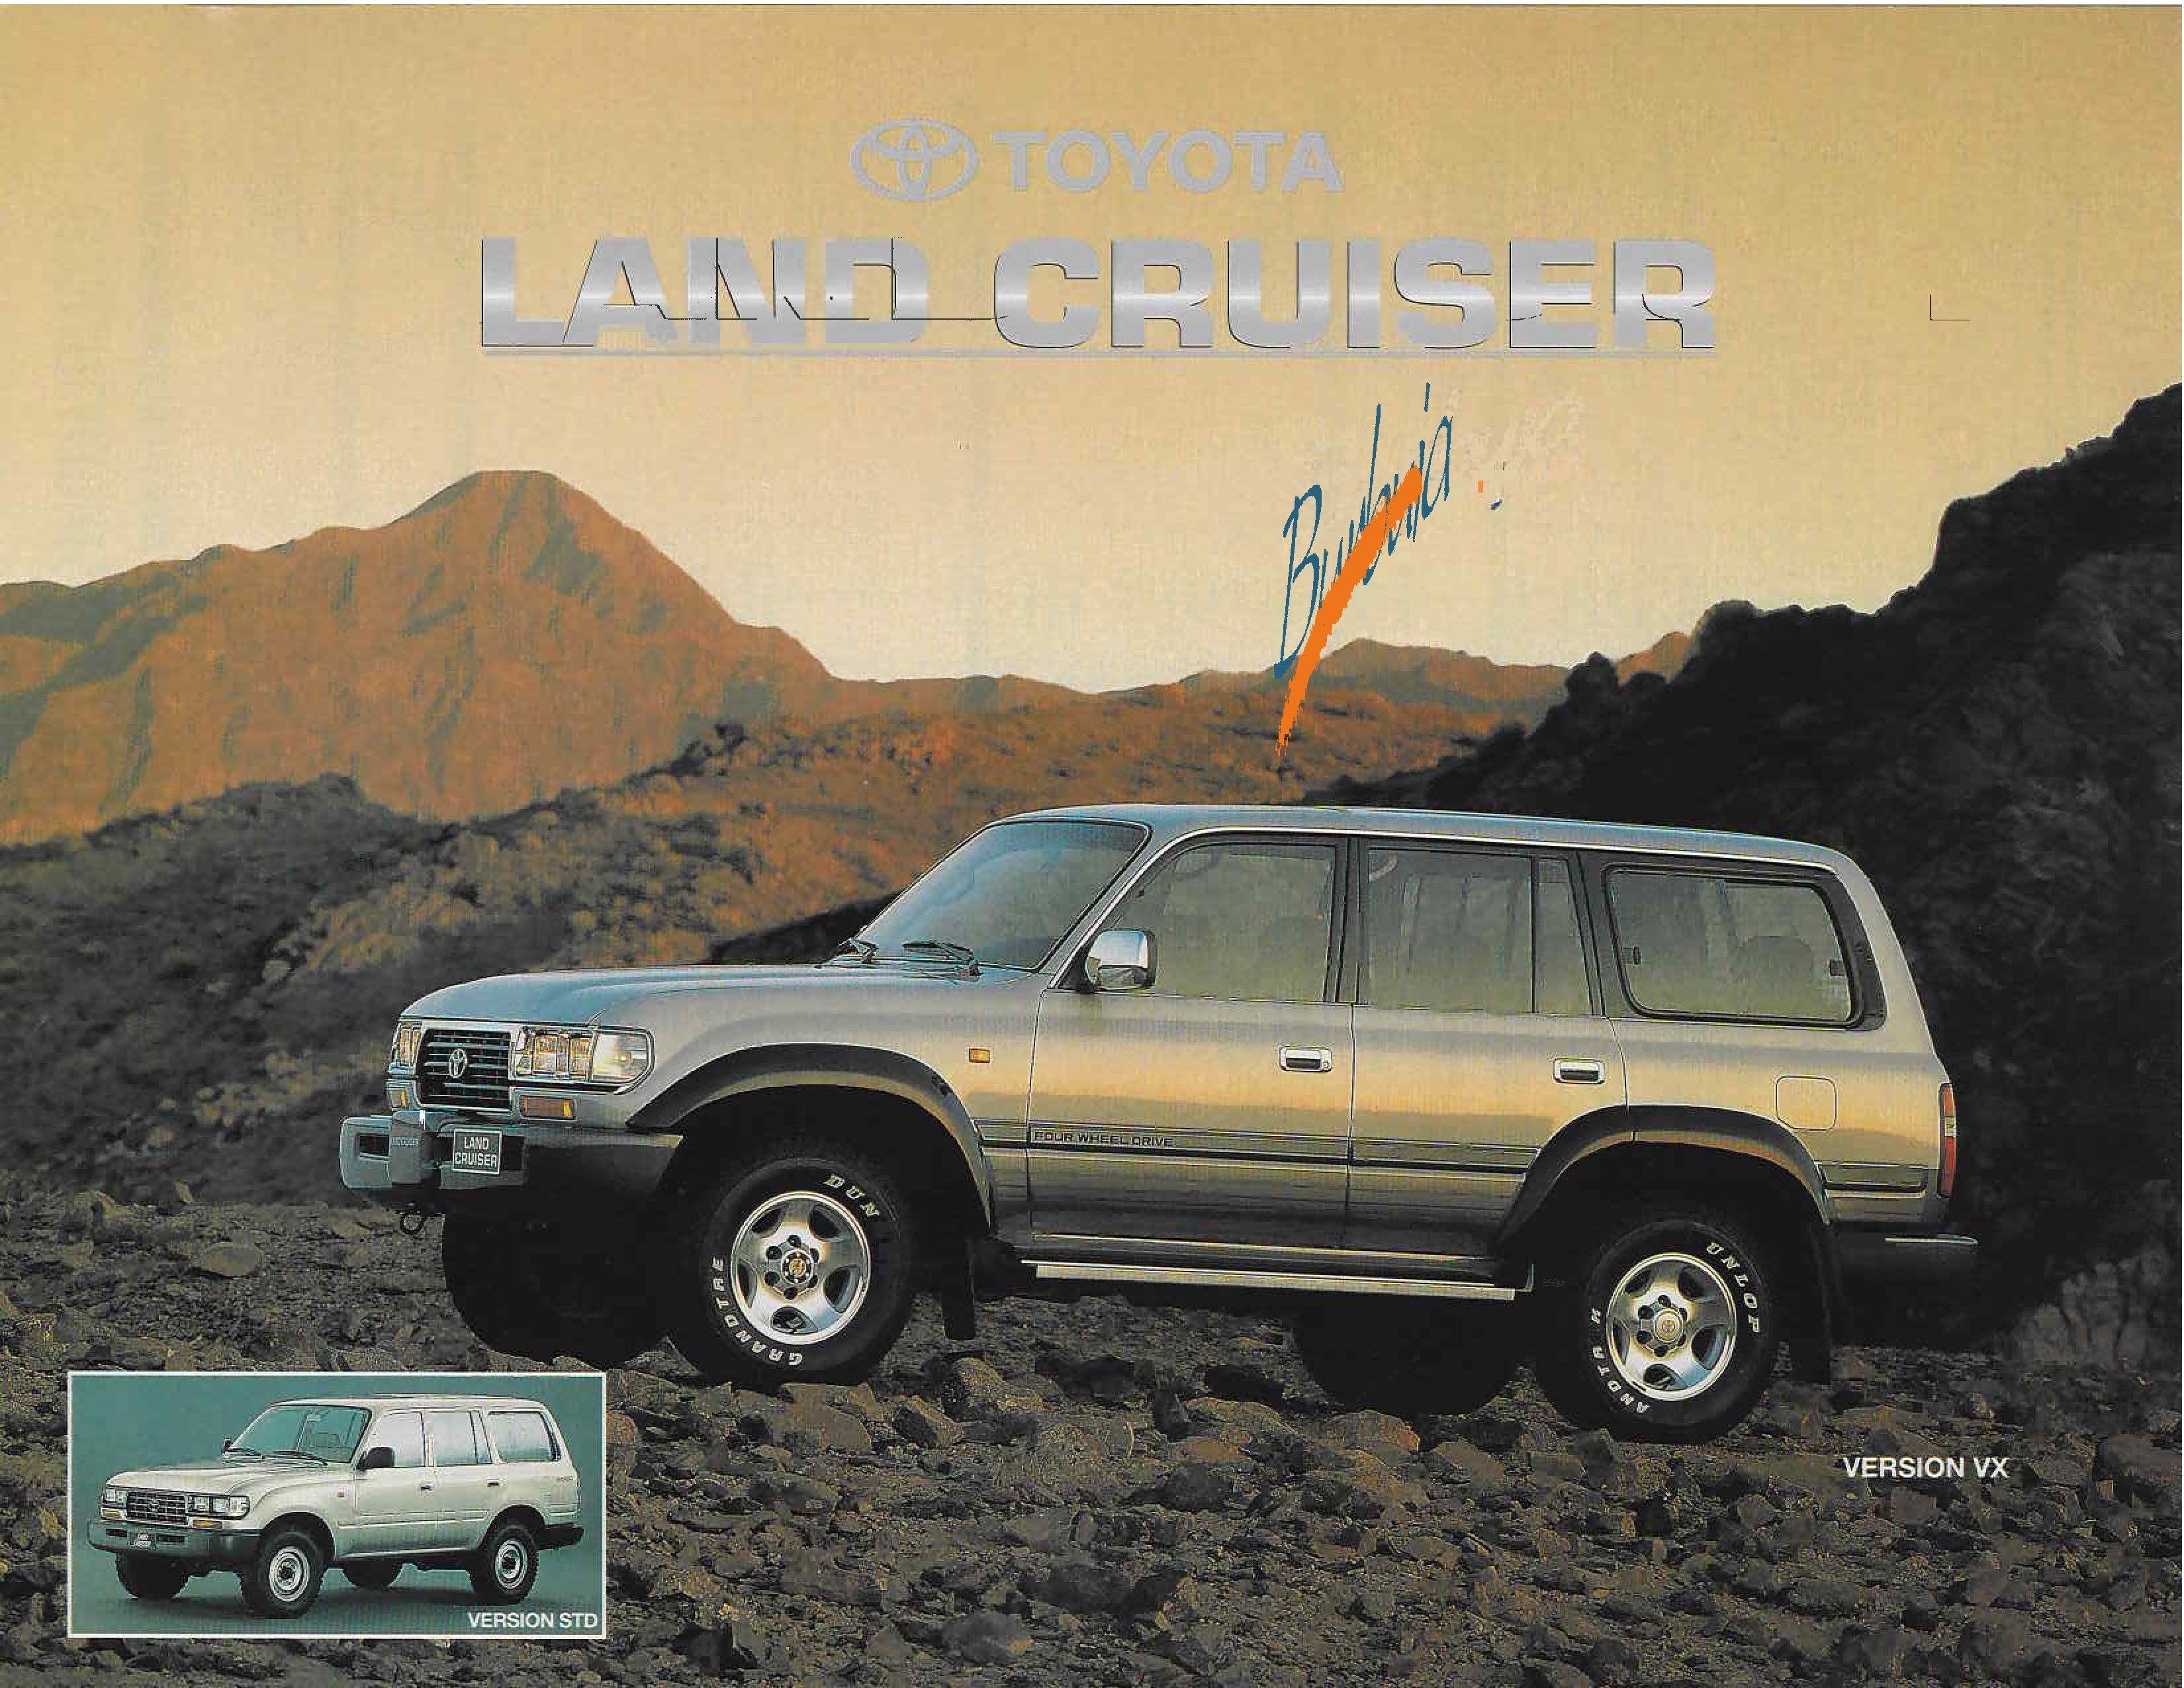 1995 Toyota Land Cruiser Brochure Toyota Land Cruiser Land Cruiser Toyota Lc